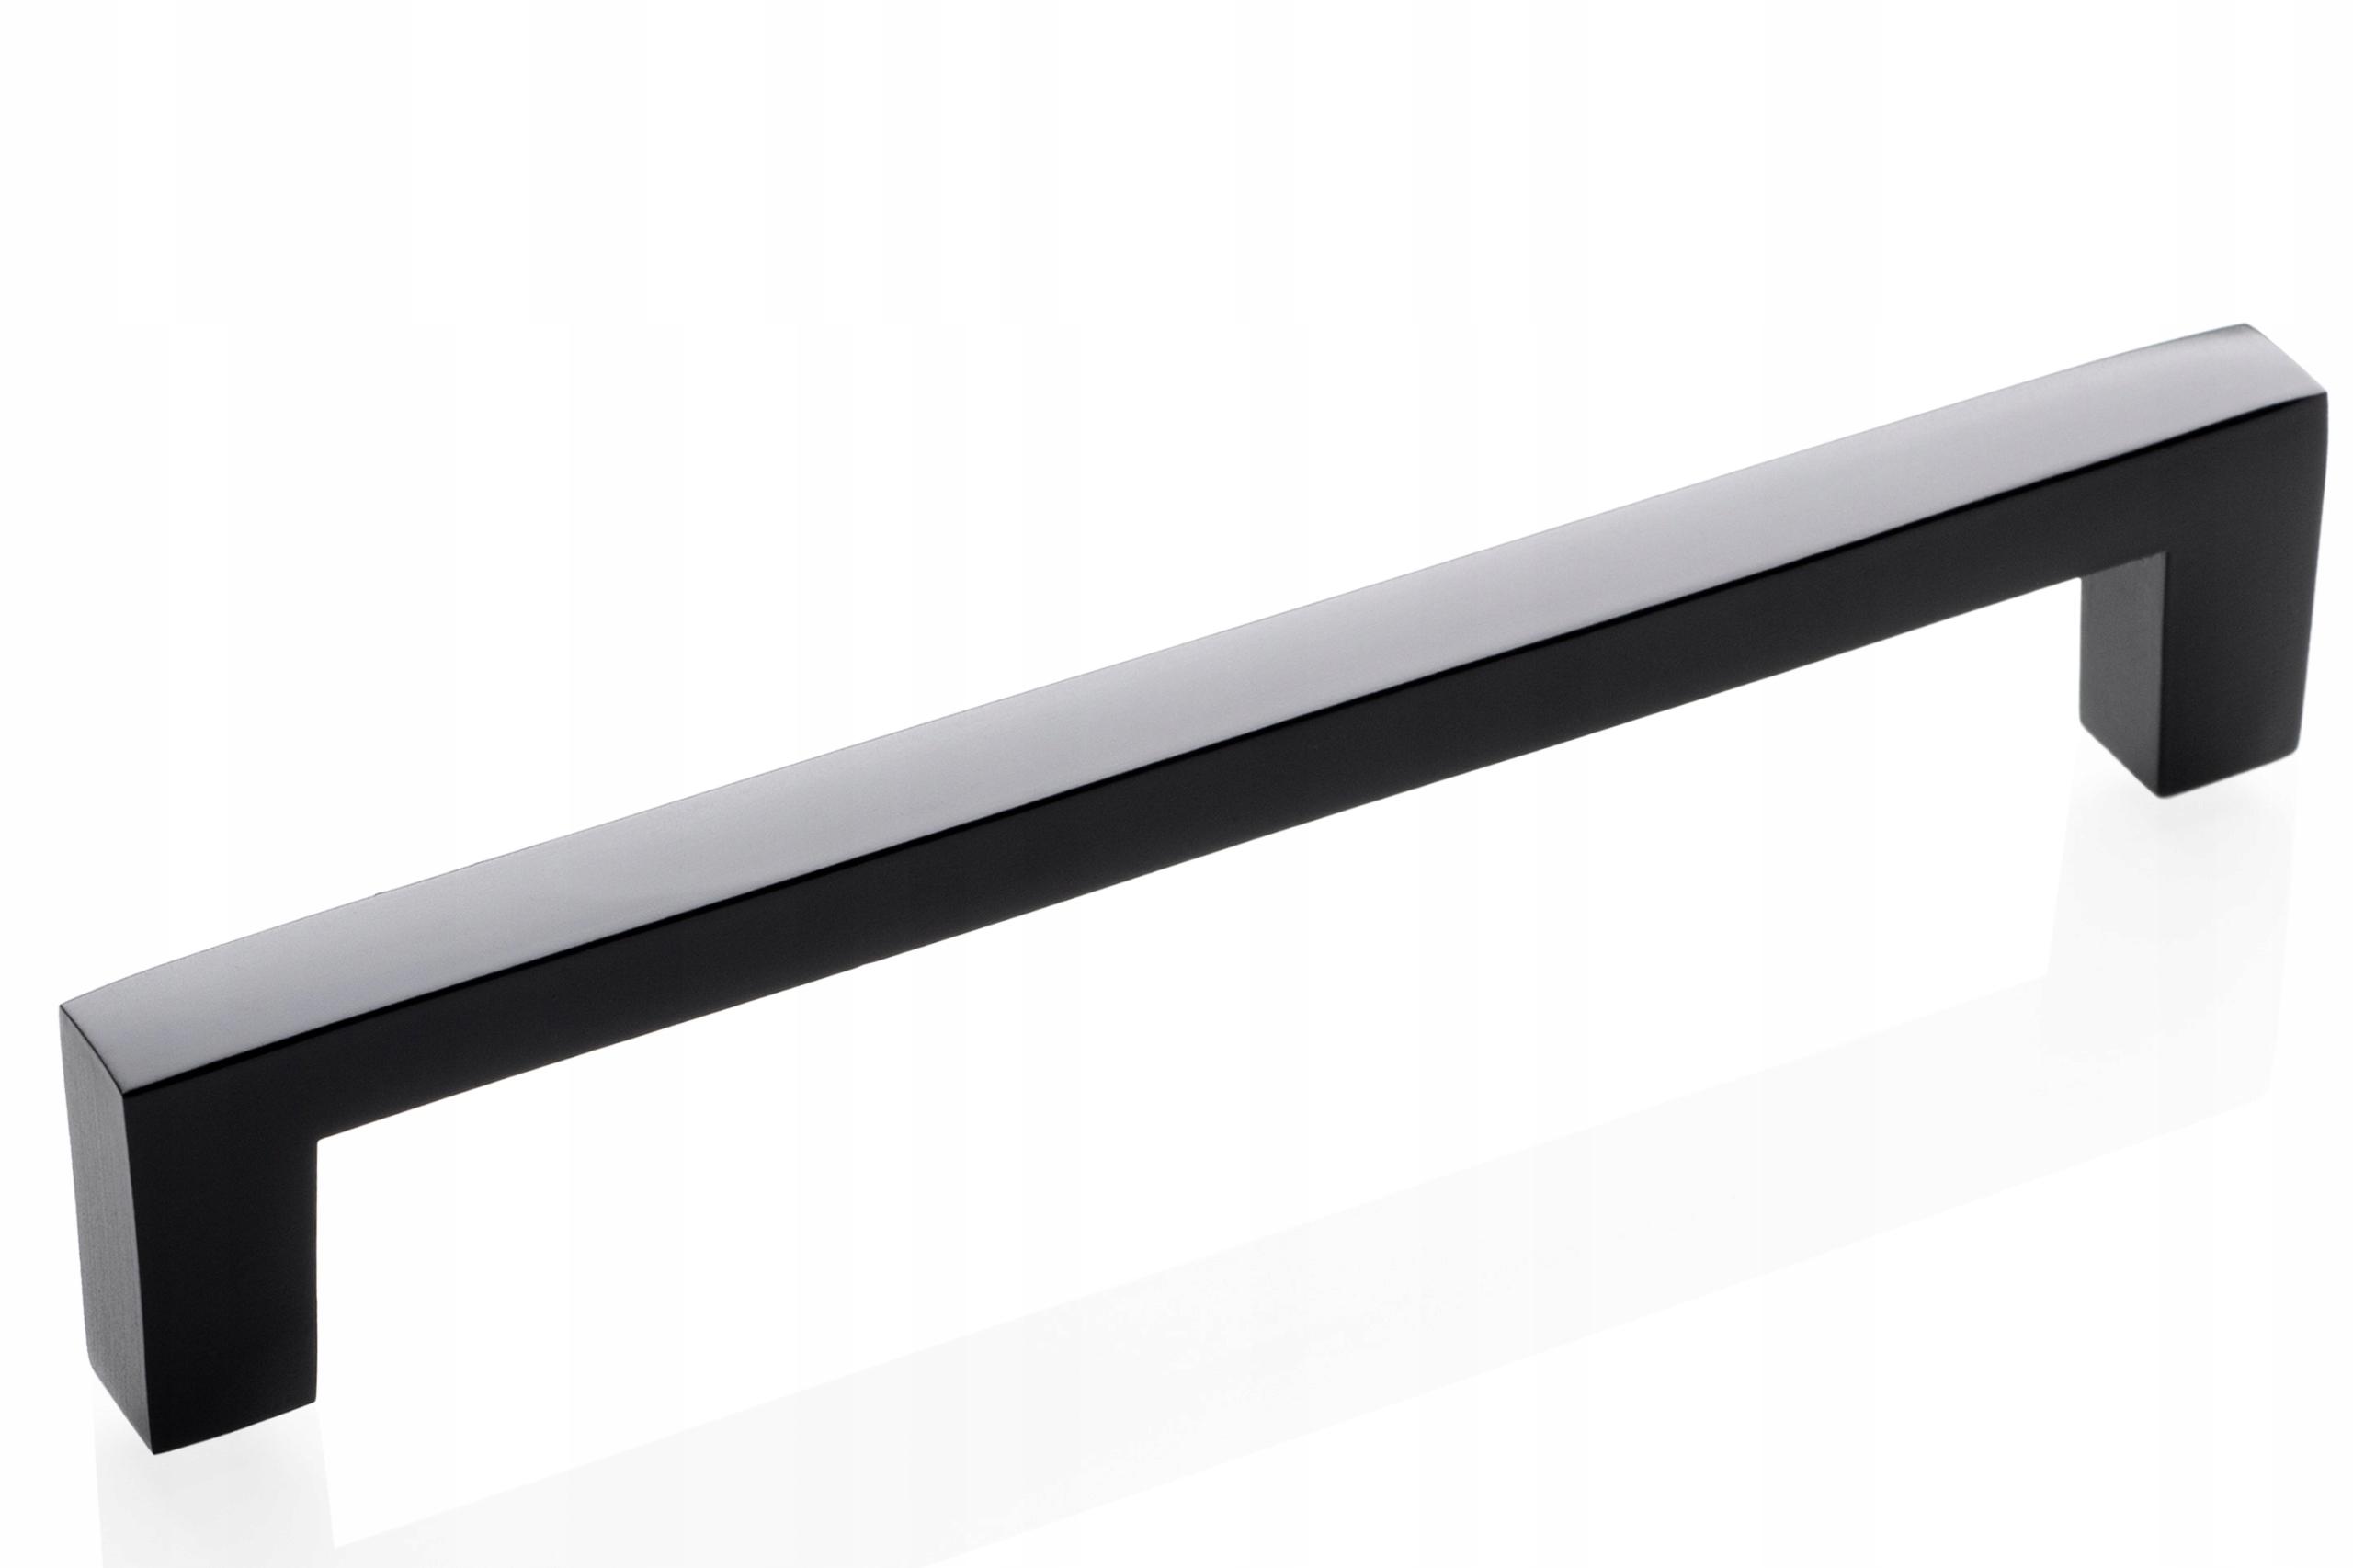 Uchwyt Meblowy VELOR BLACK - czarny MAT 96 mm